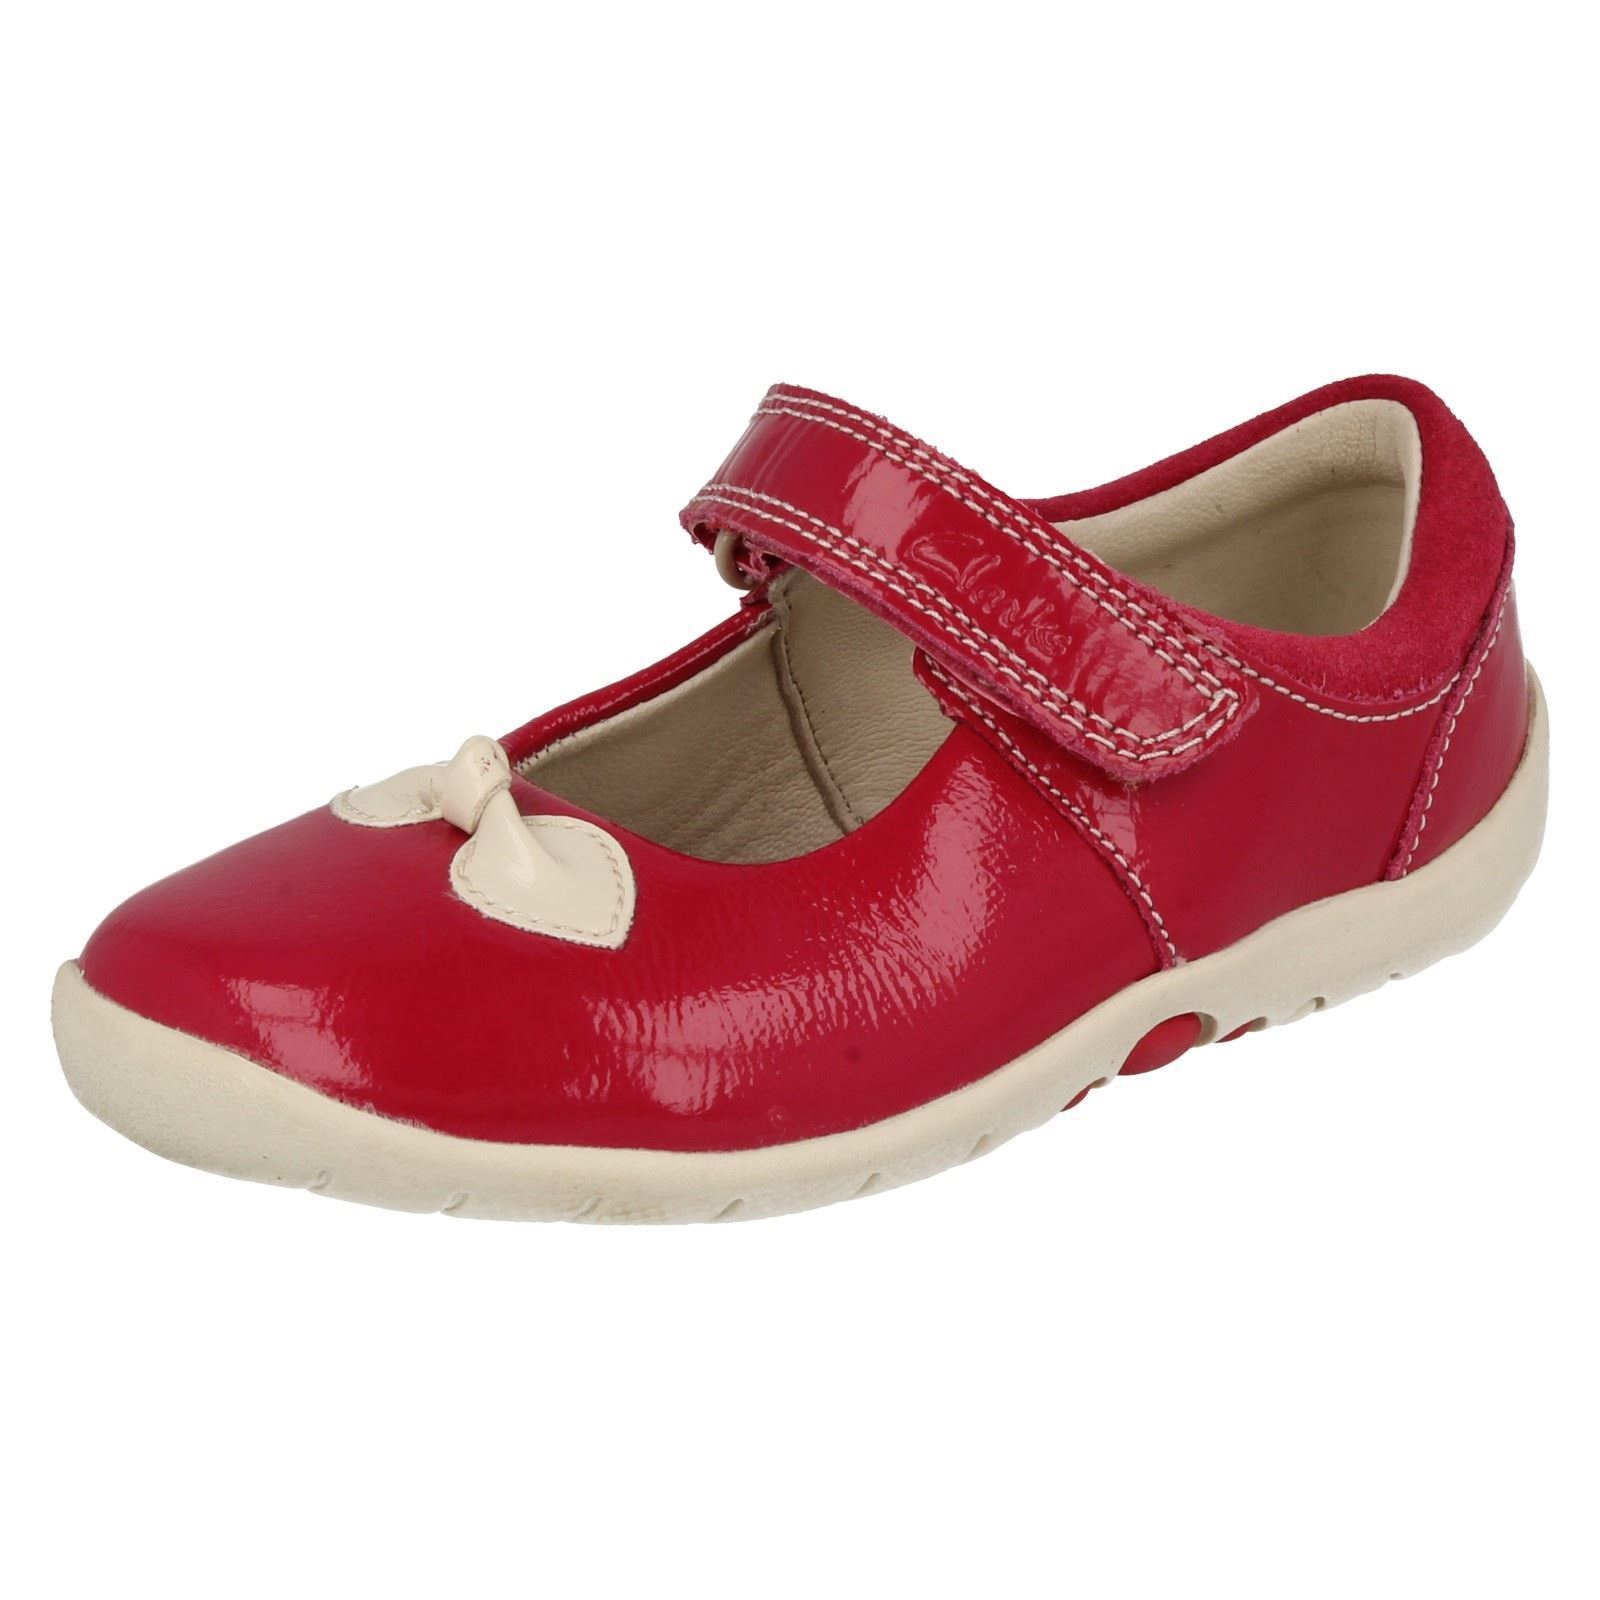 Zapatos para rosa niñas Clarks diseño con Berry Clarks Soft 66HrqwT